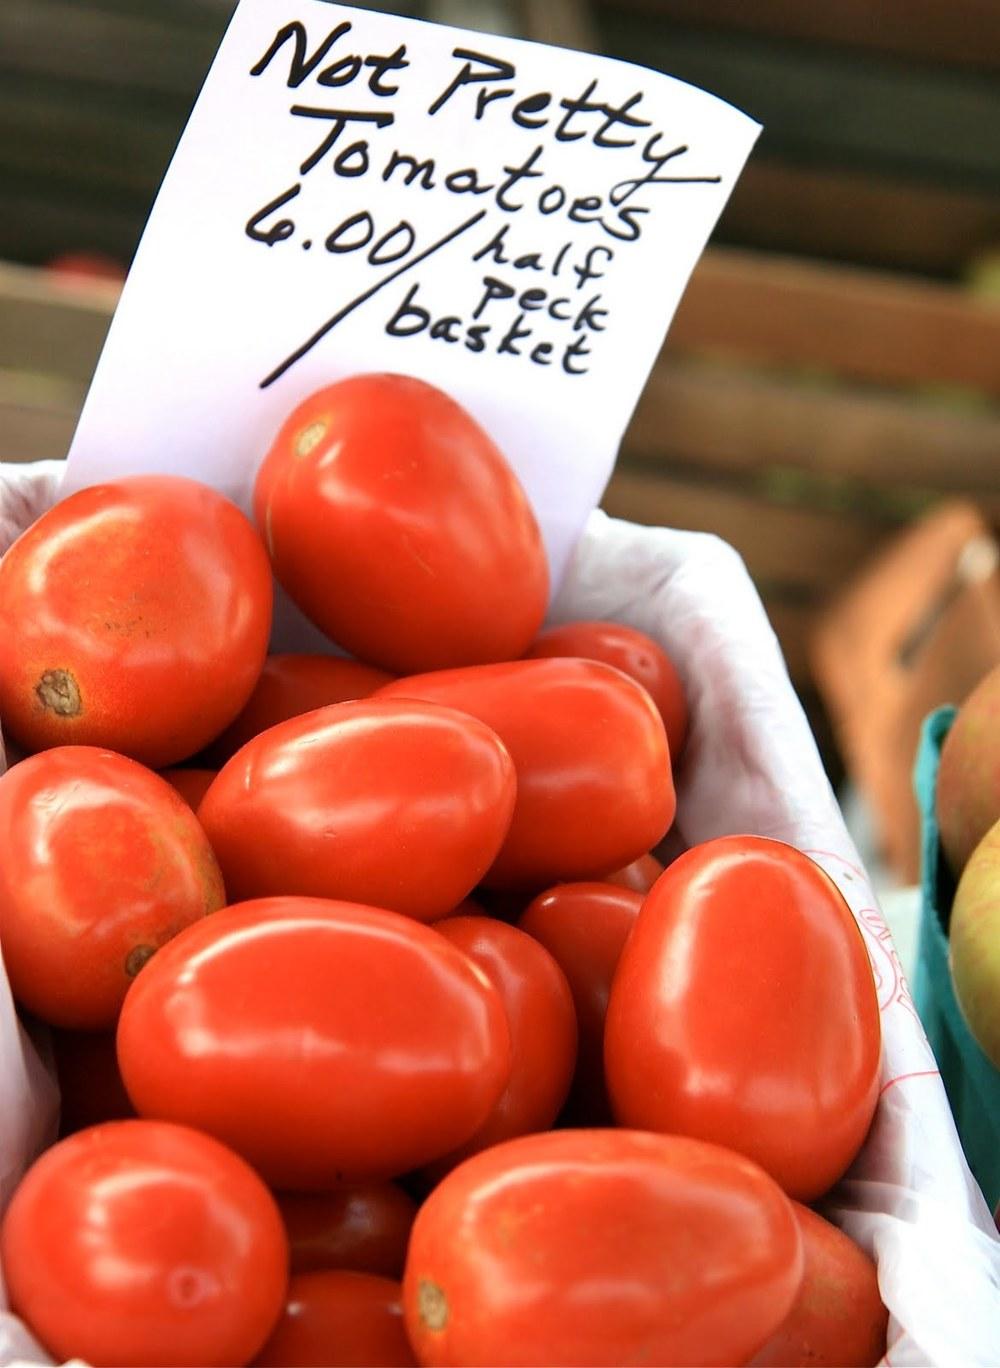 bexley farmers market tomatoes.jpg